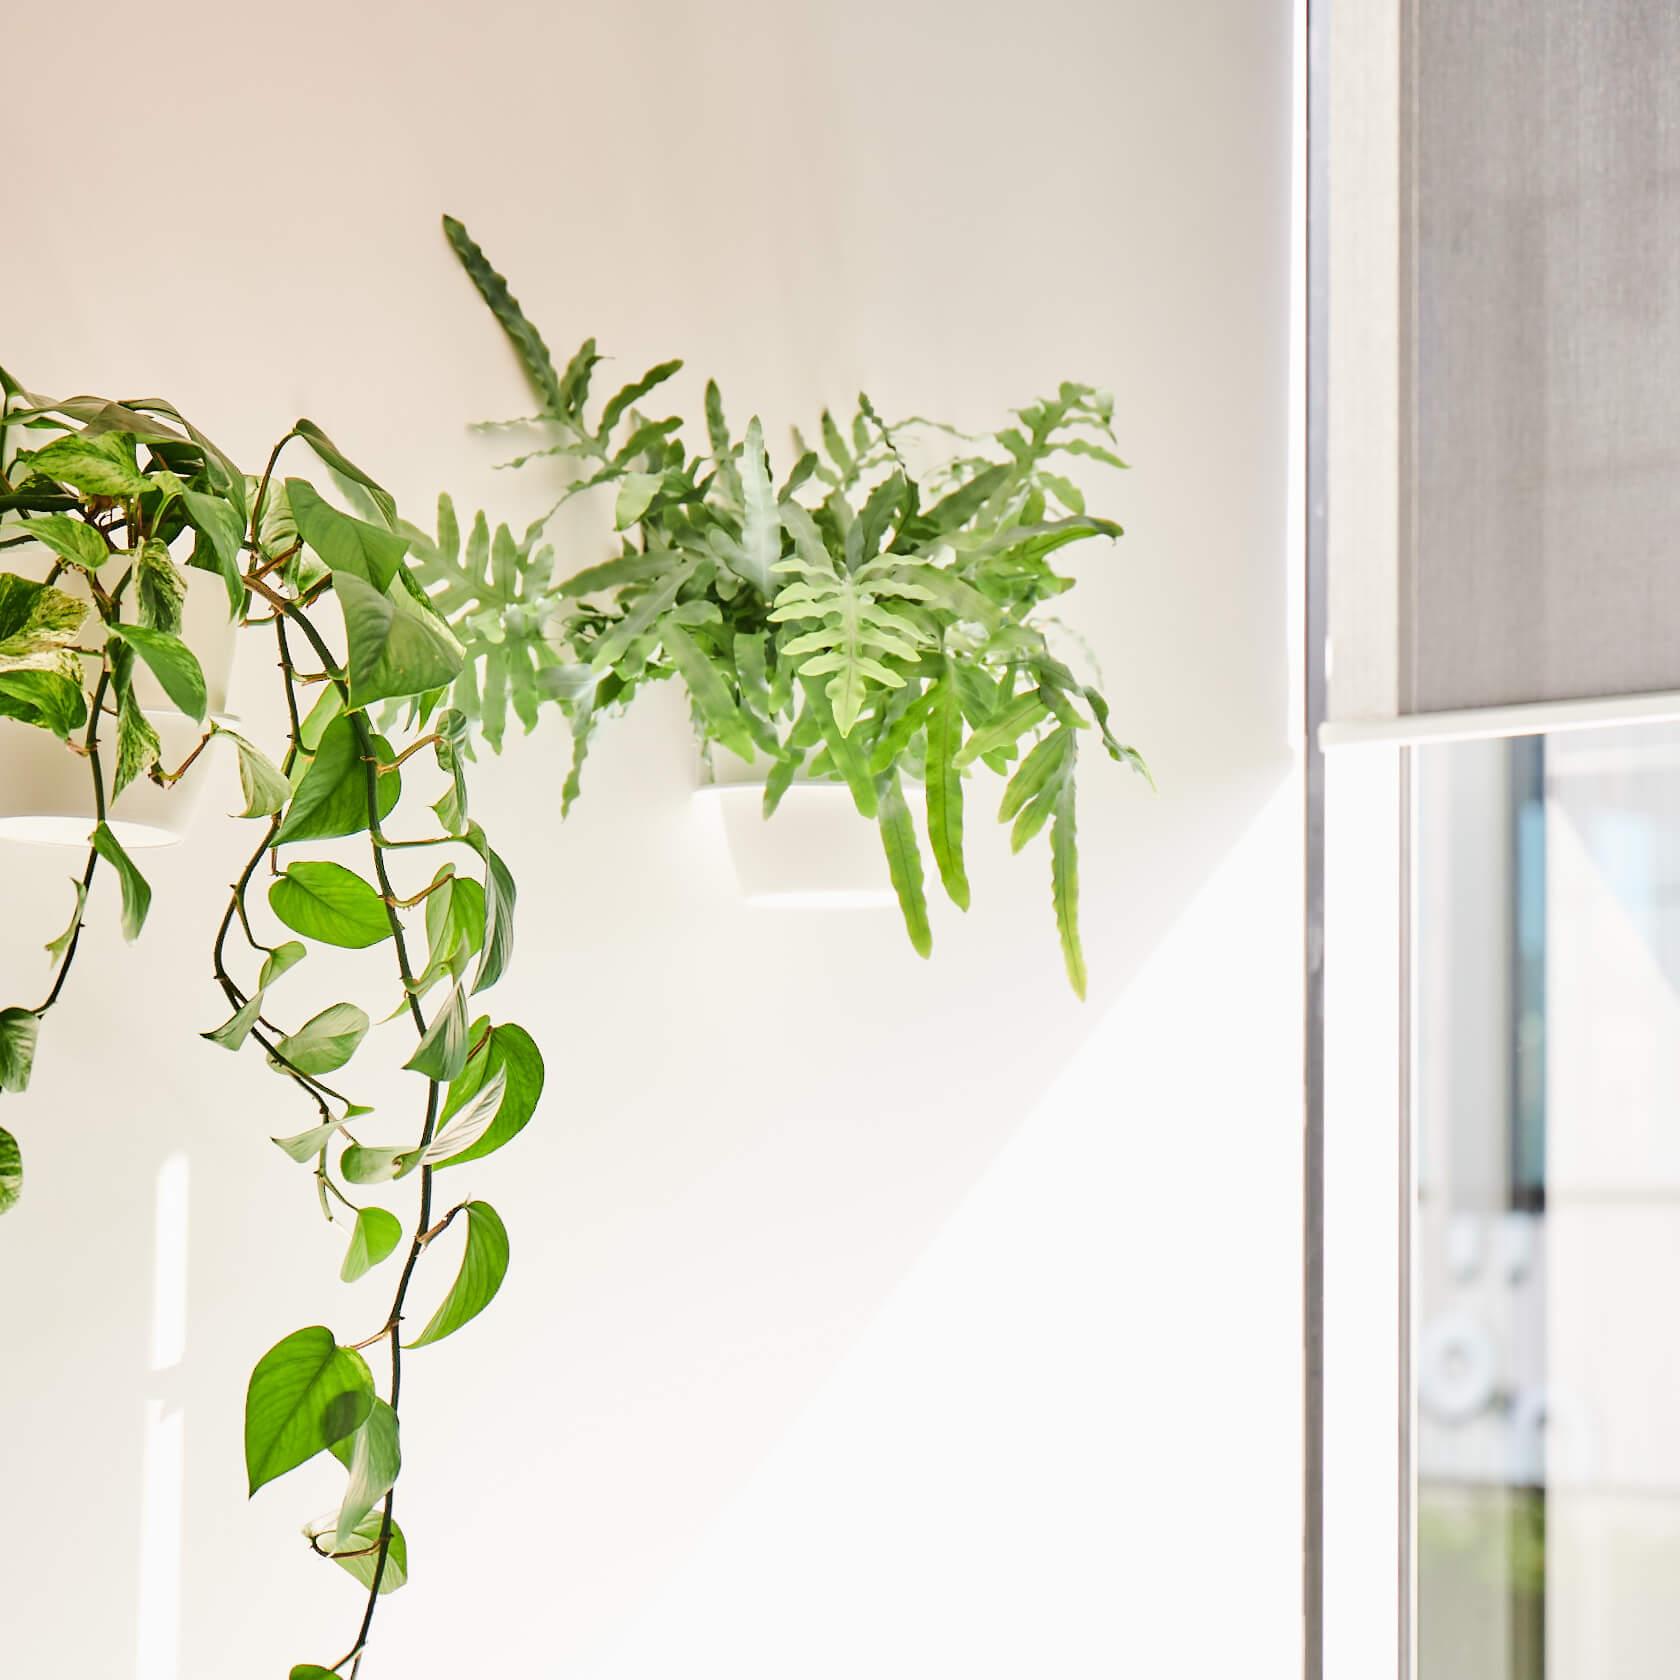 portfolio-offices-spaces-mitchellvranges-image5